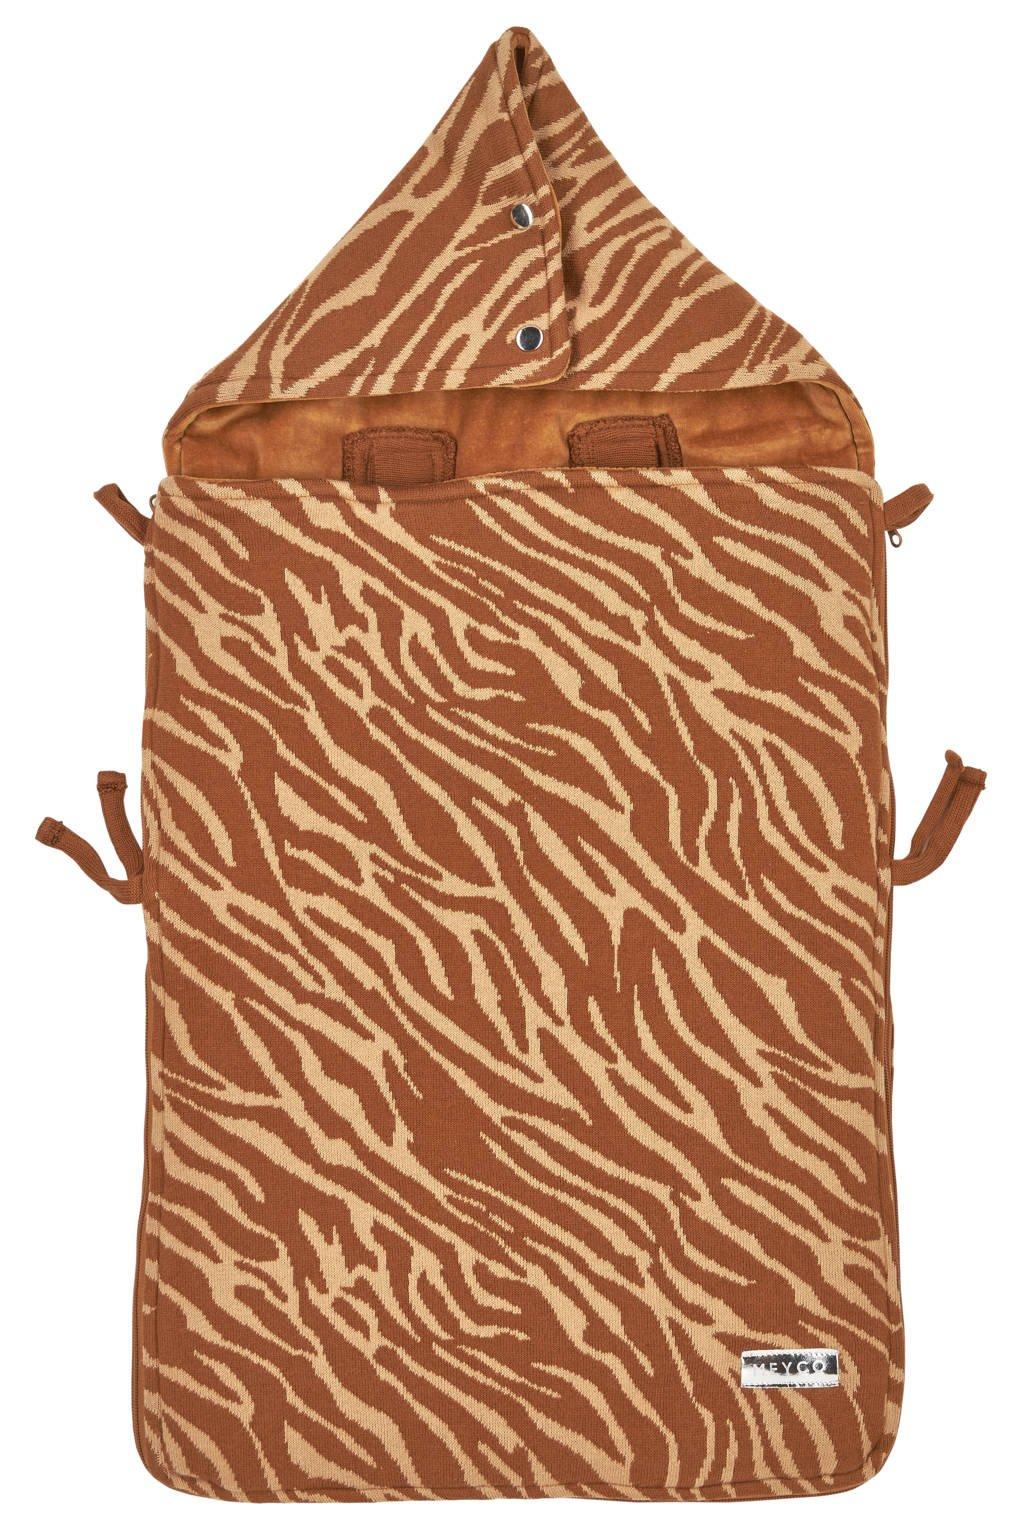 Meyco autostoel voetenzak Zebra camel, Camel